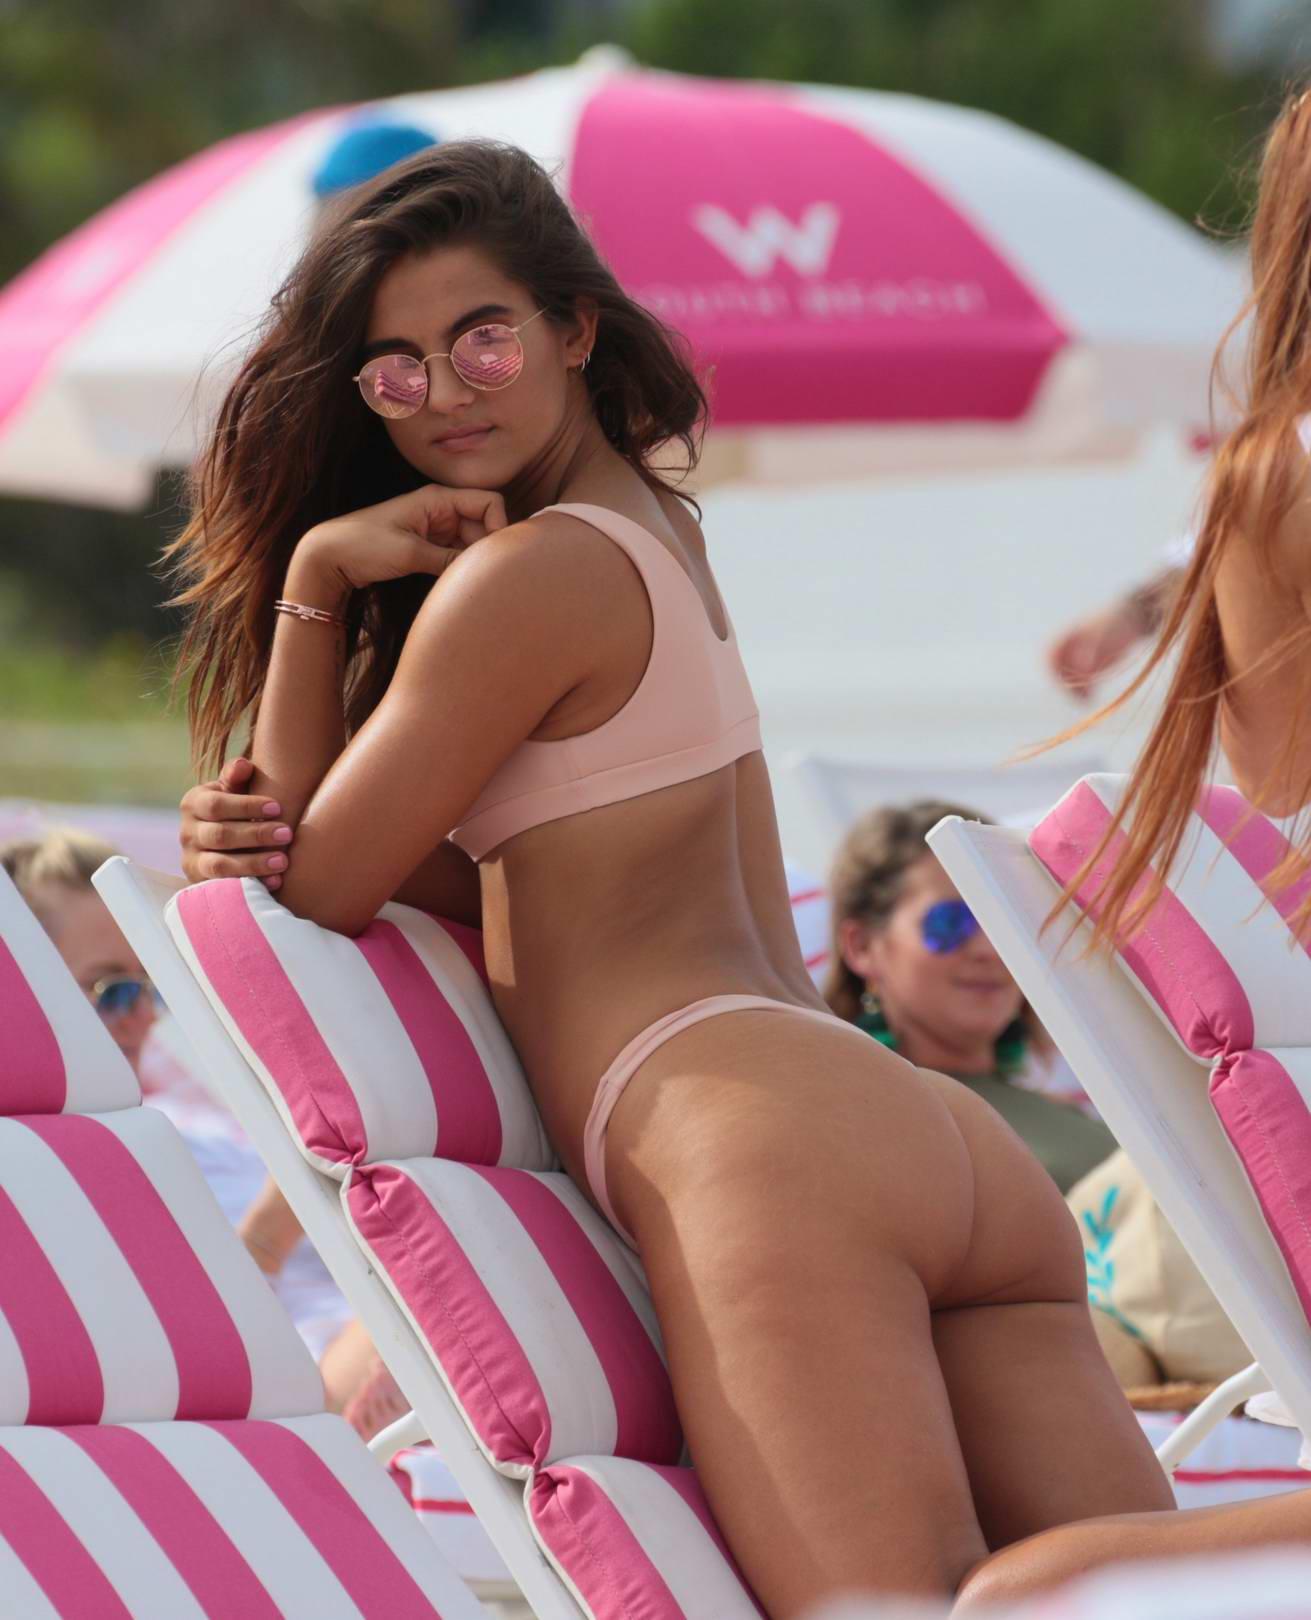 Pics Amanda Riley nudes (28 photo), Ass, Fappening, Boobs, cameltoe 2018